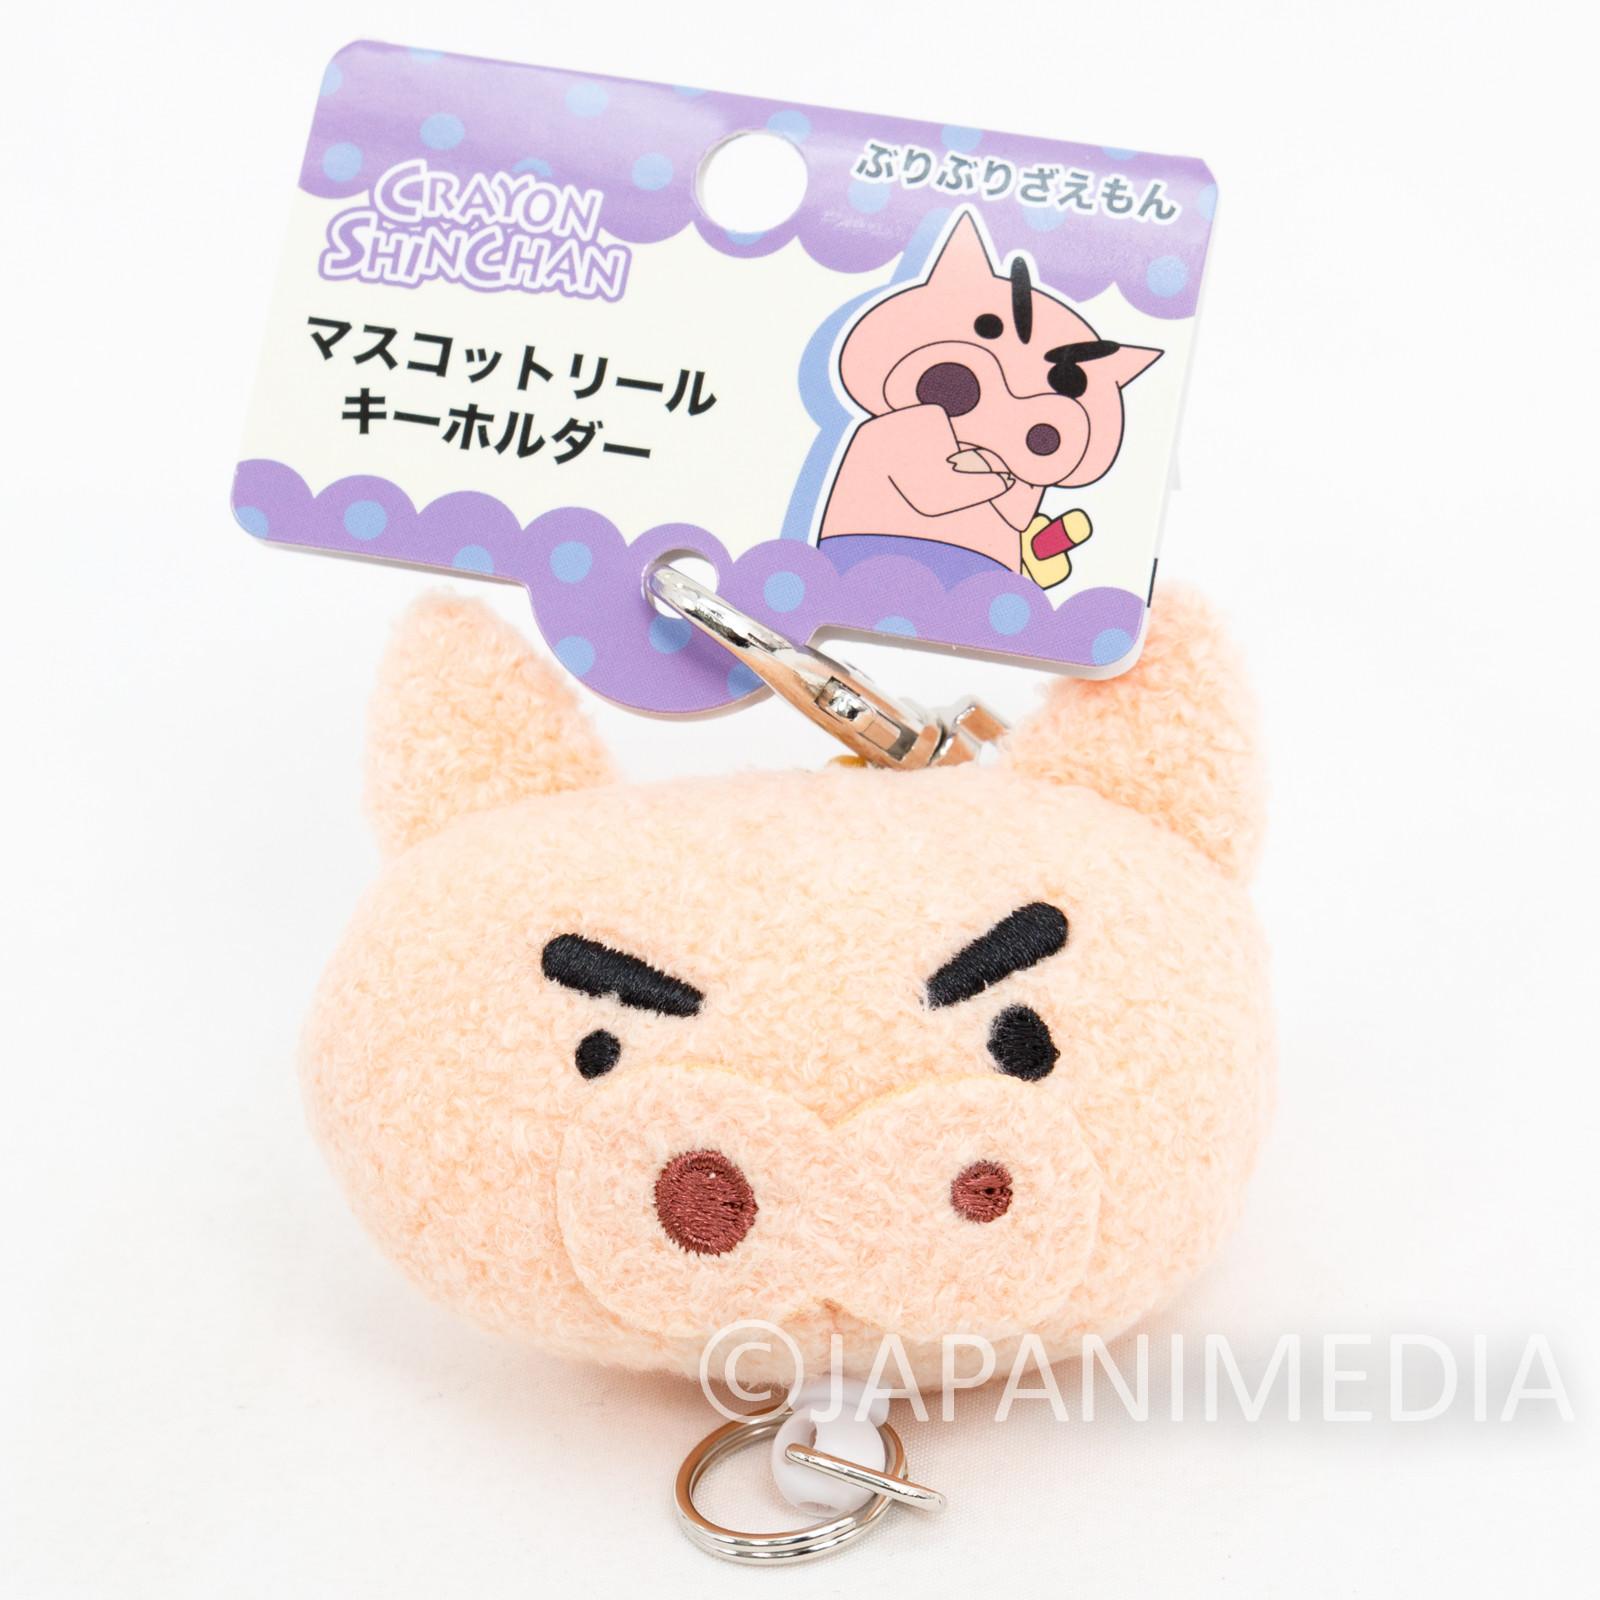 Crayon Shin-chan Buriburizaemon Plush Doll Mascot Reel Keychain JAPAN ANIME